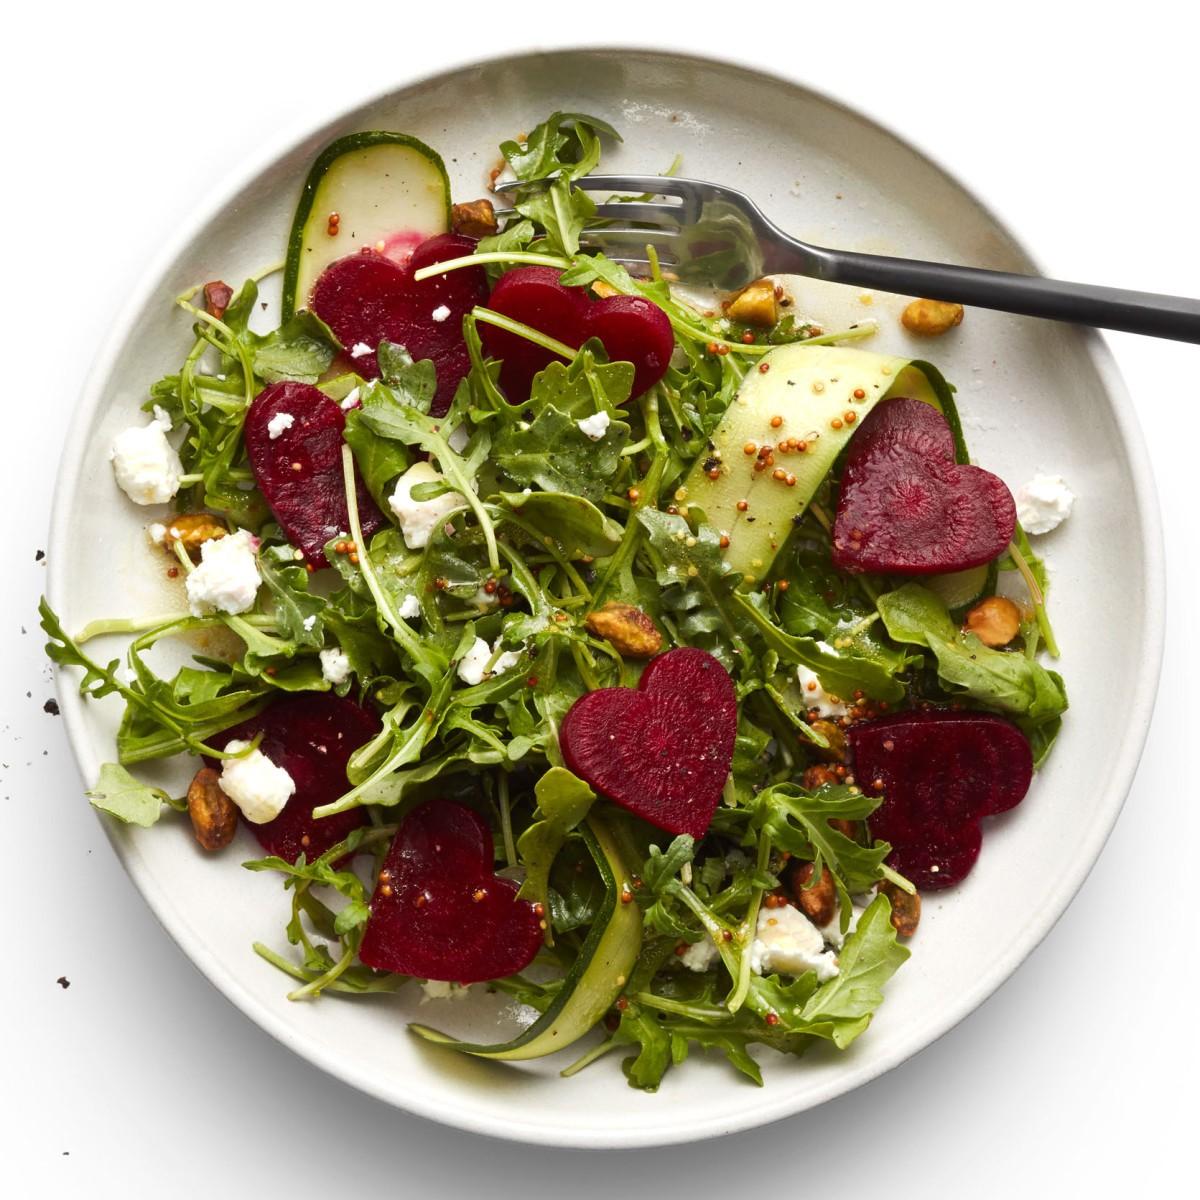 Salade romantique.